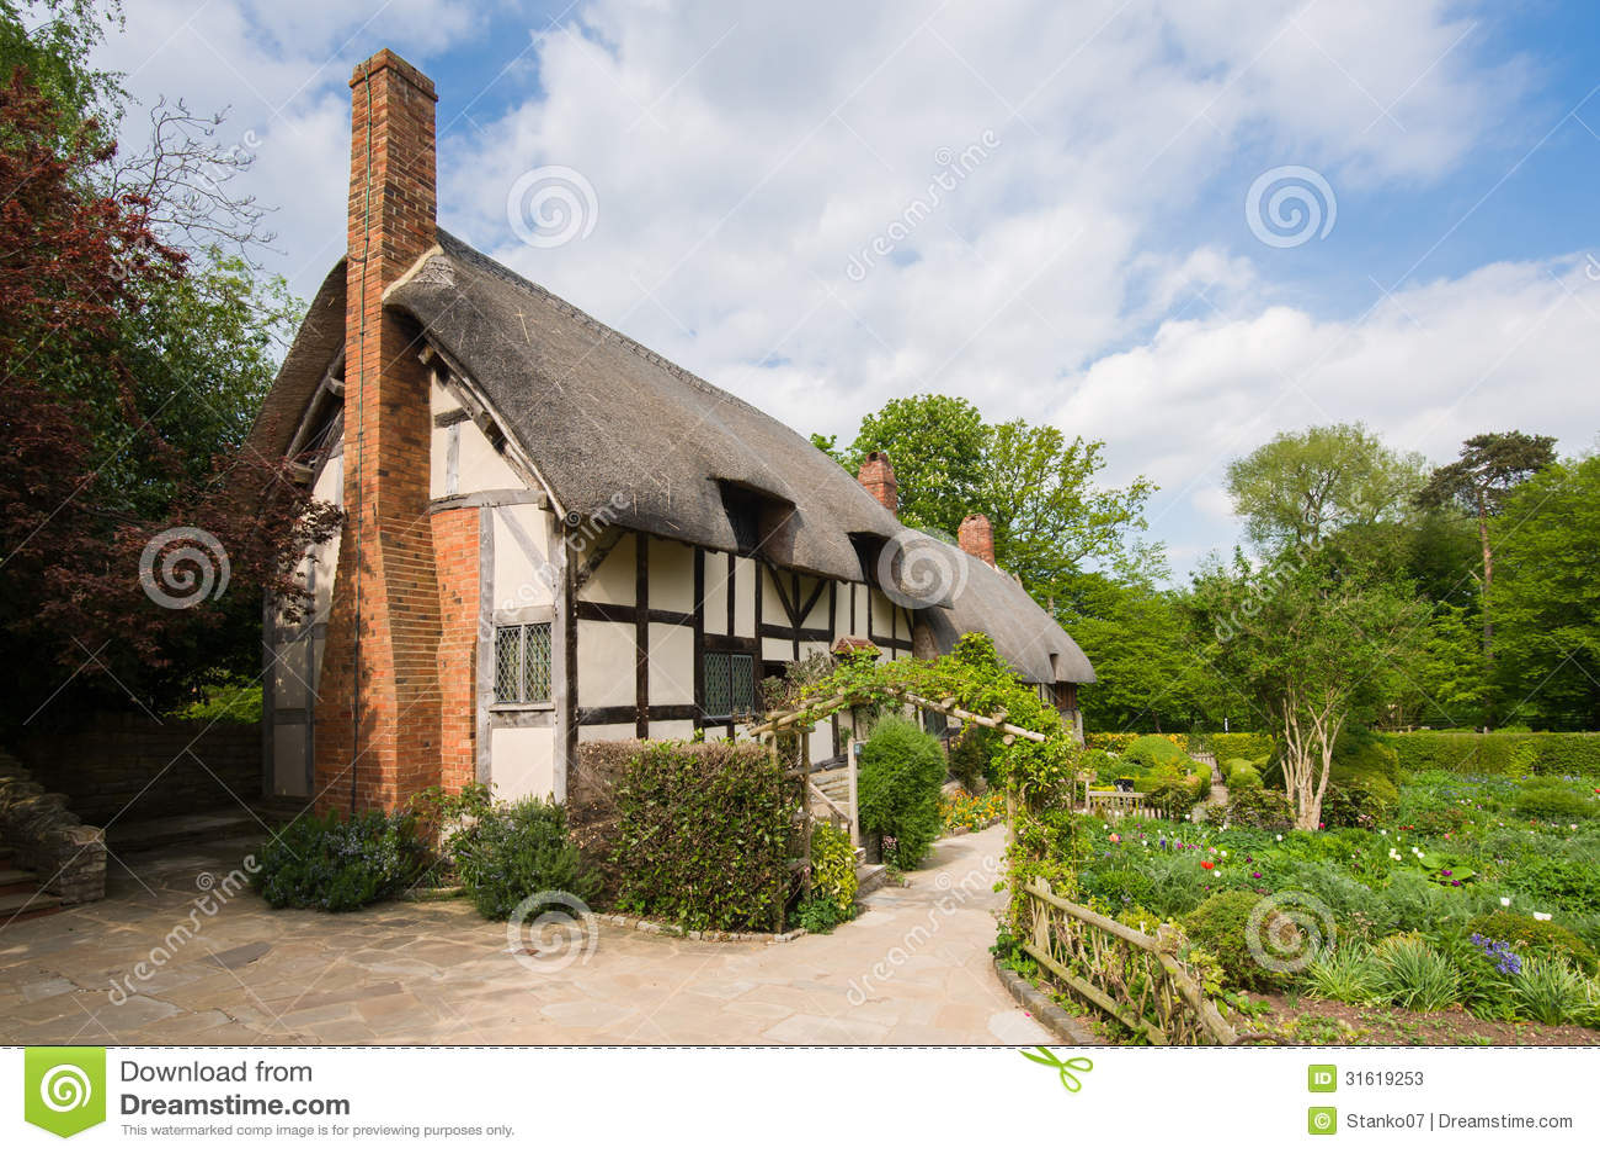 Old Rural English Cottage Stock Image Image Of